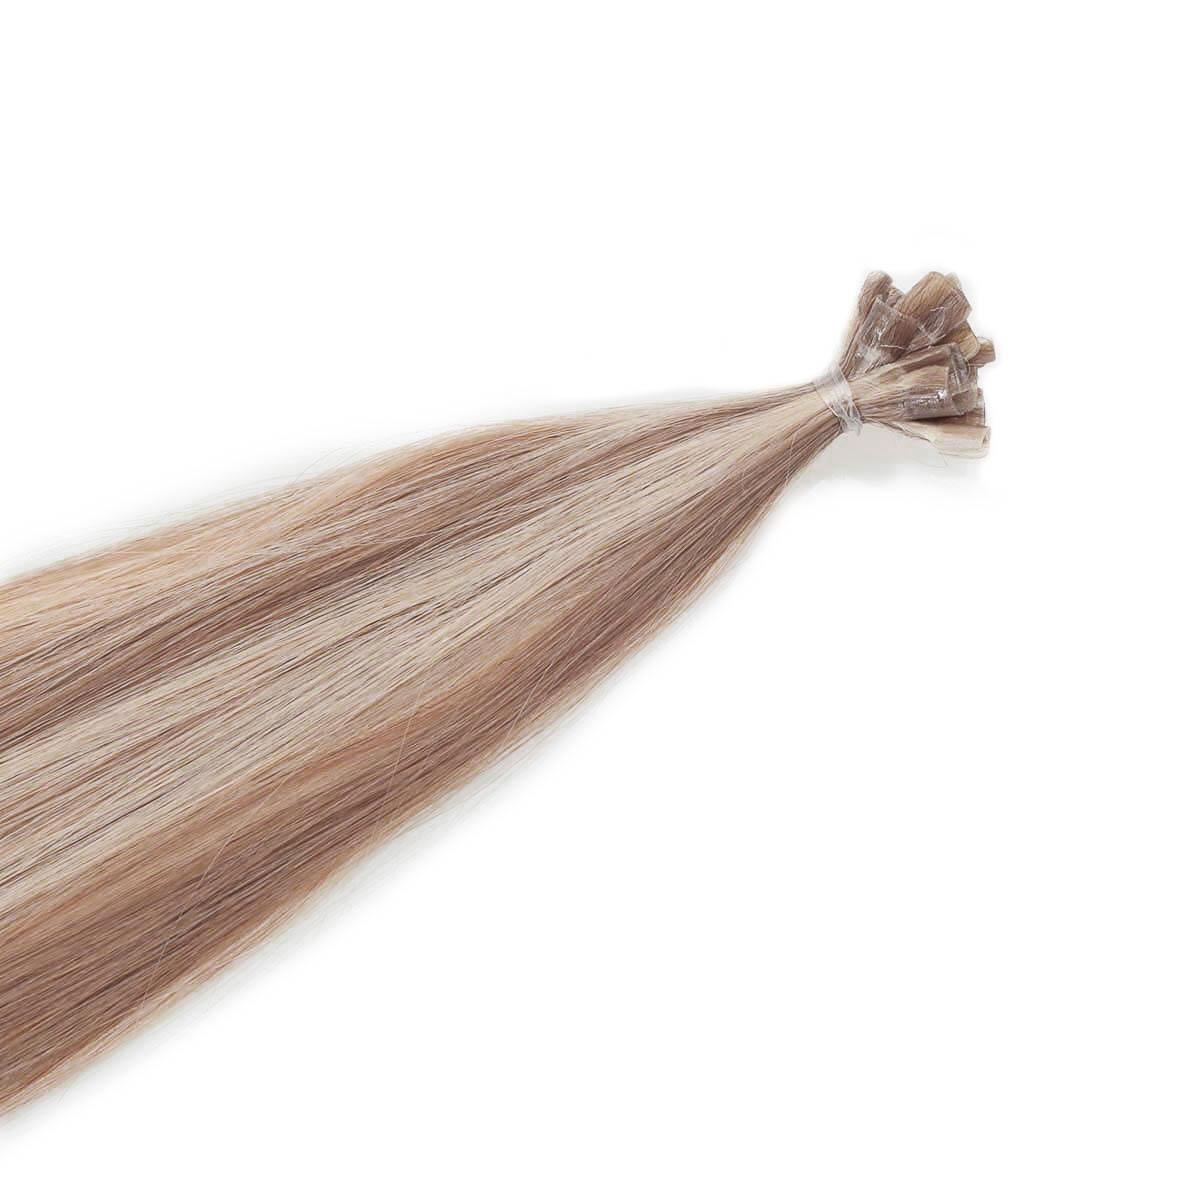 Nail Hair M7.3/10.8 Cendre Ash Blonde Mix 50 cm